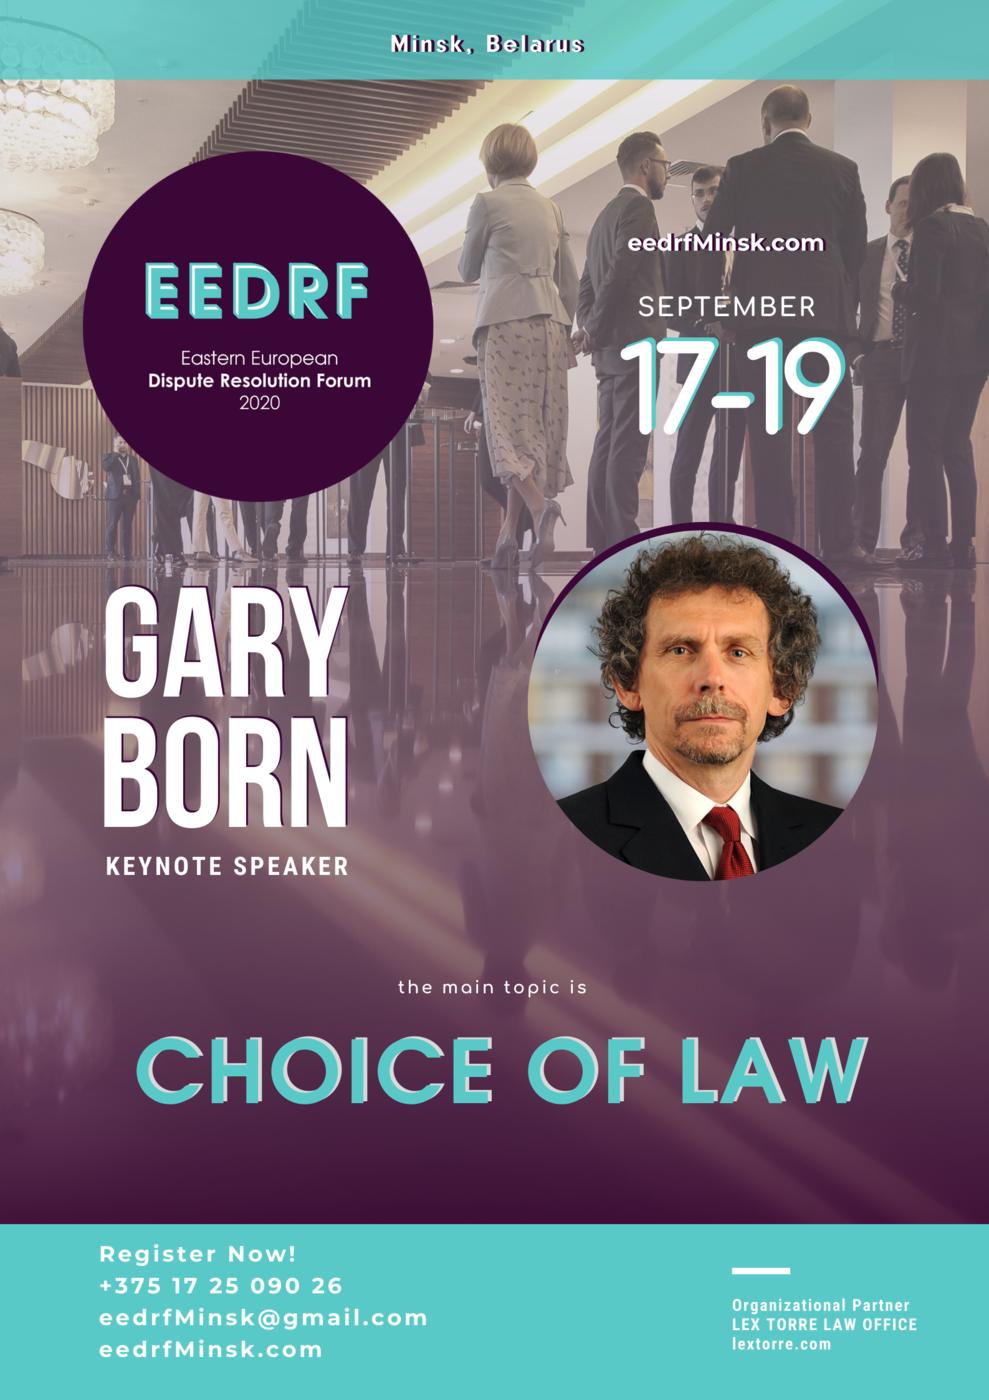 EEDRF 2020 keynote Gary Born